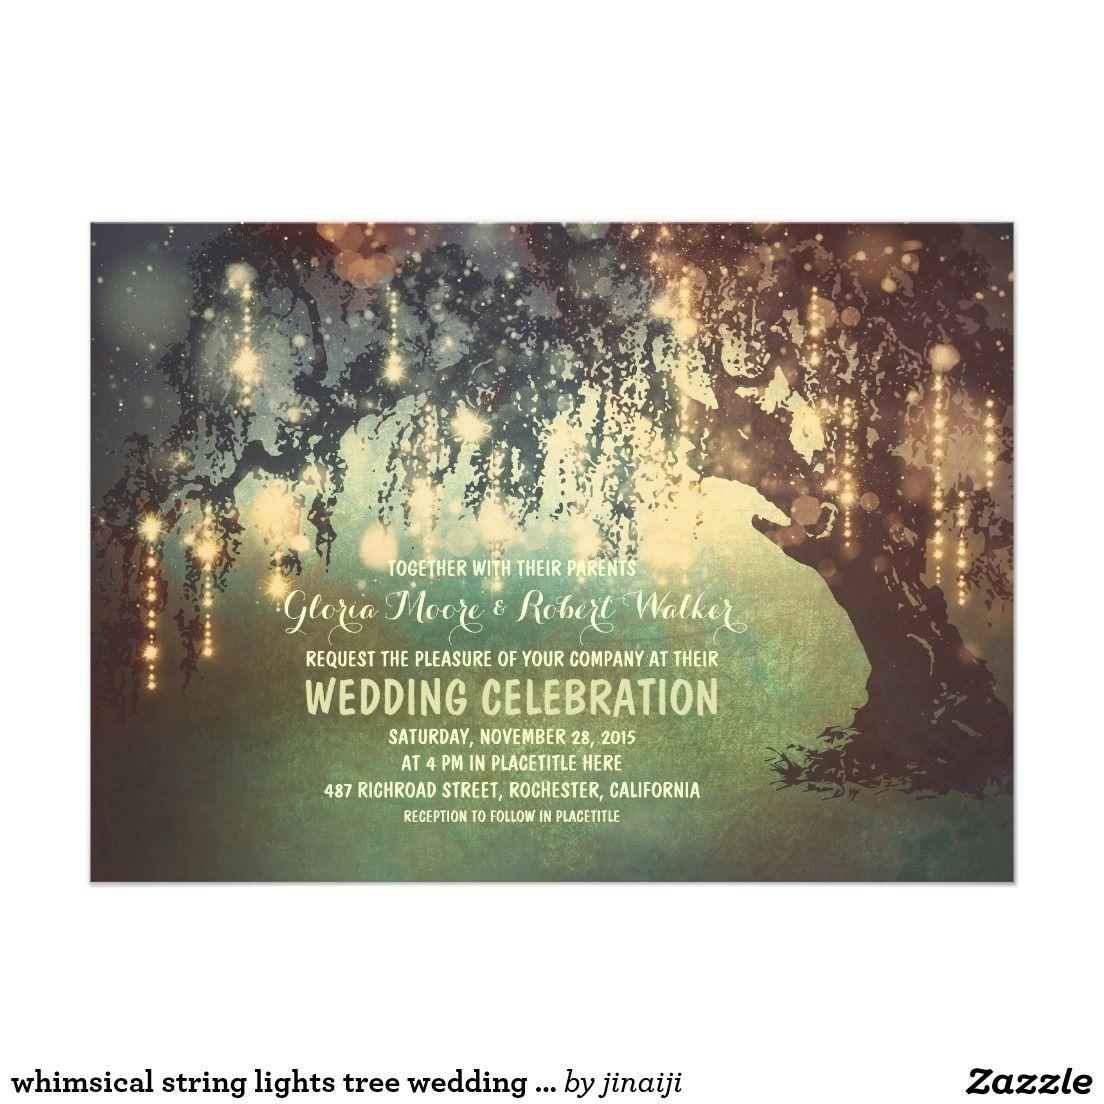 Whimsical String Lights Tree Wedding Invitations Wedding Invites